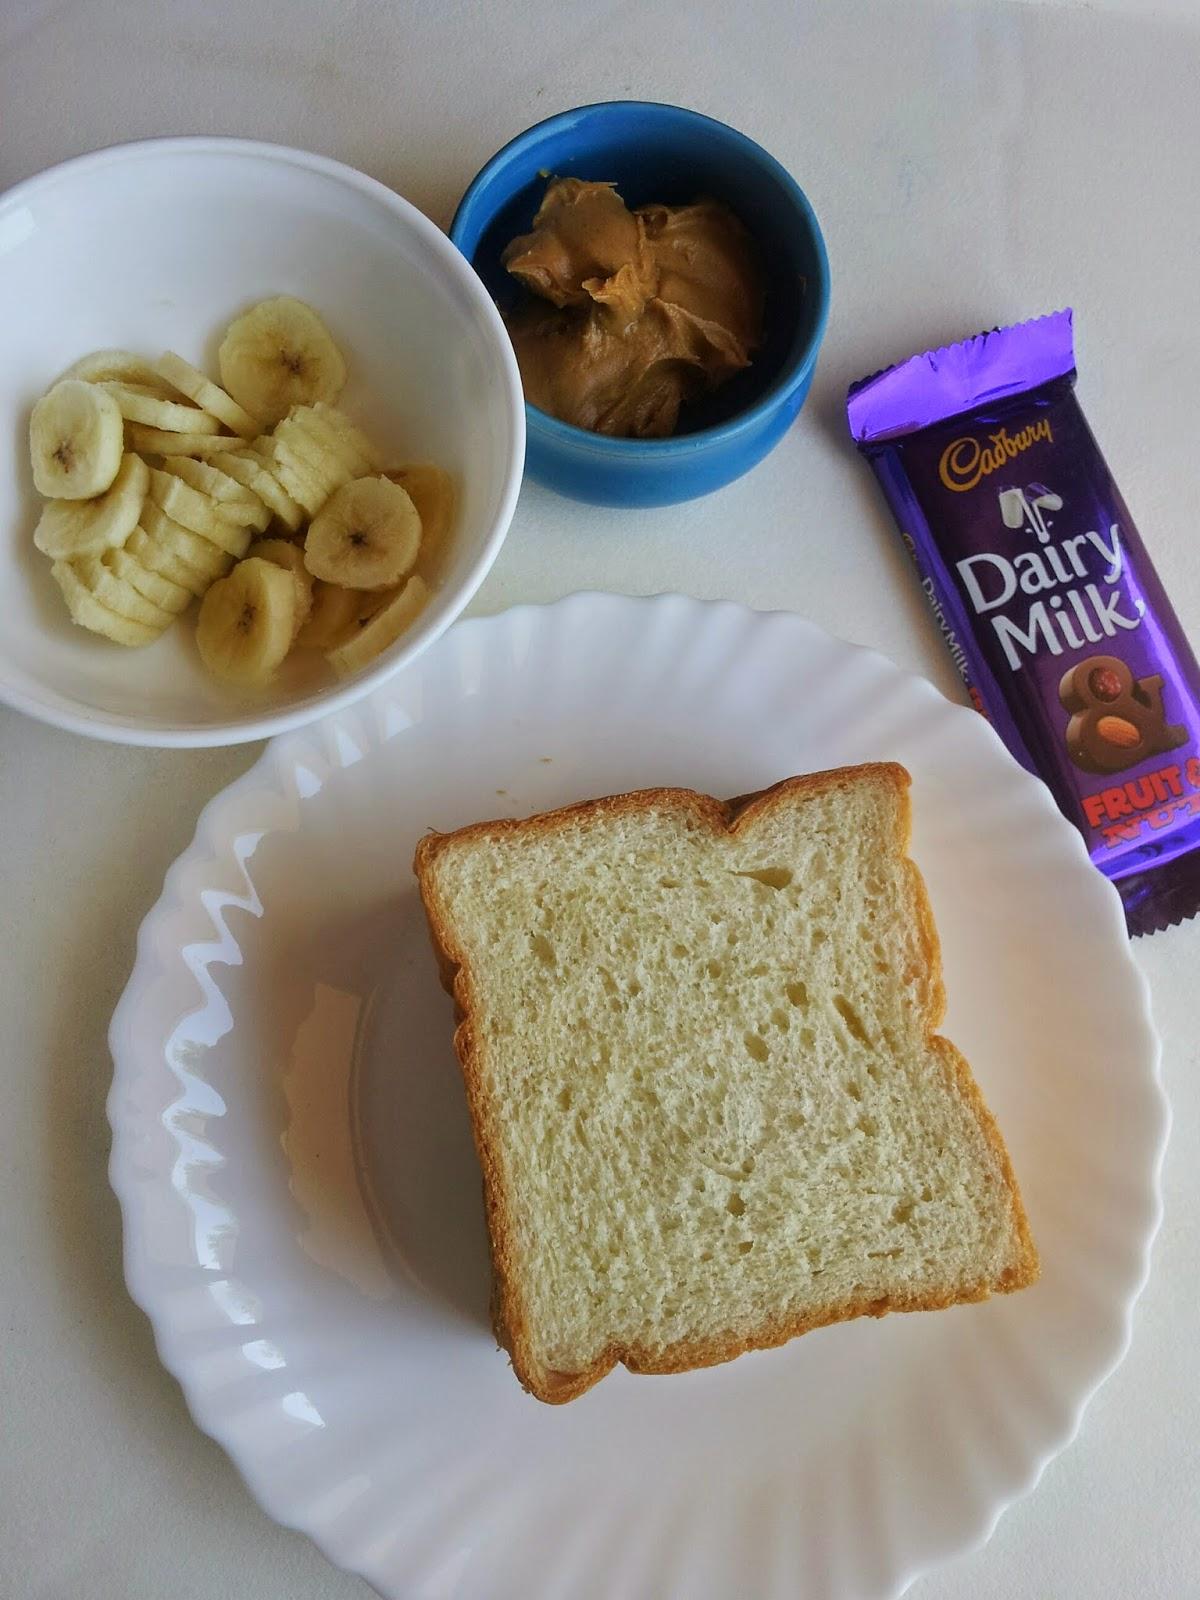 Peanut Butter(PB) chocolate banana sandwich